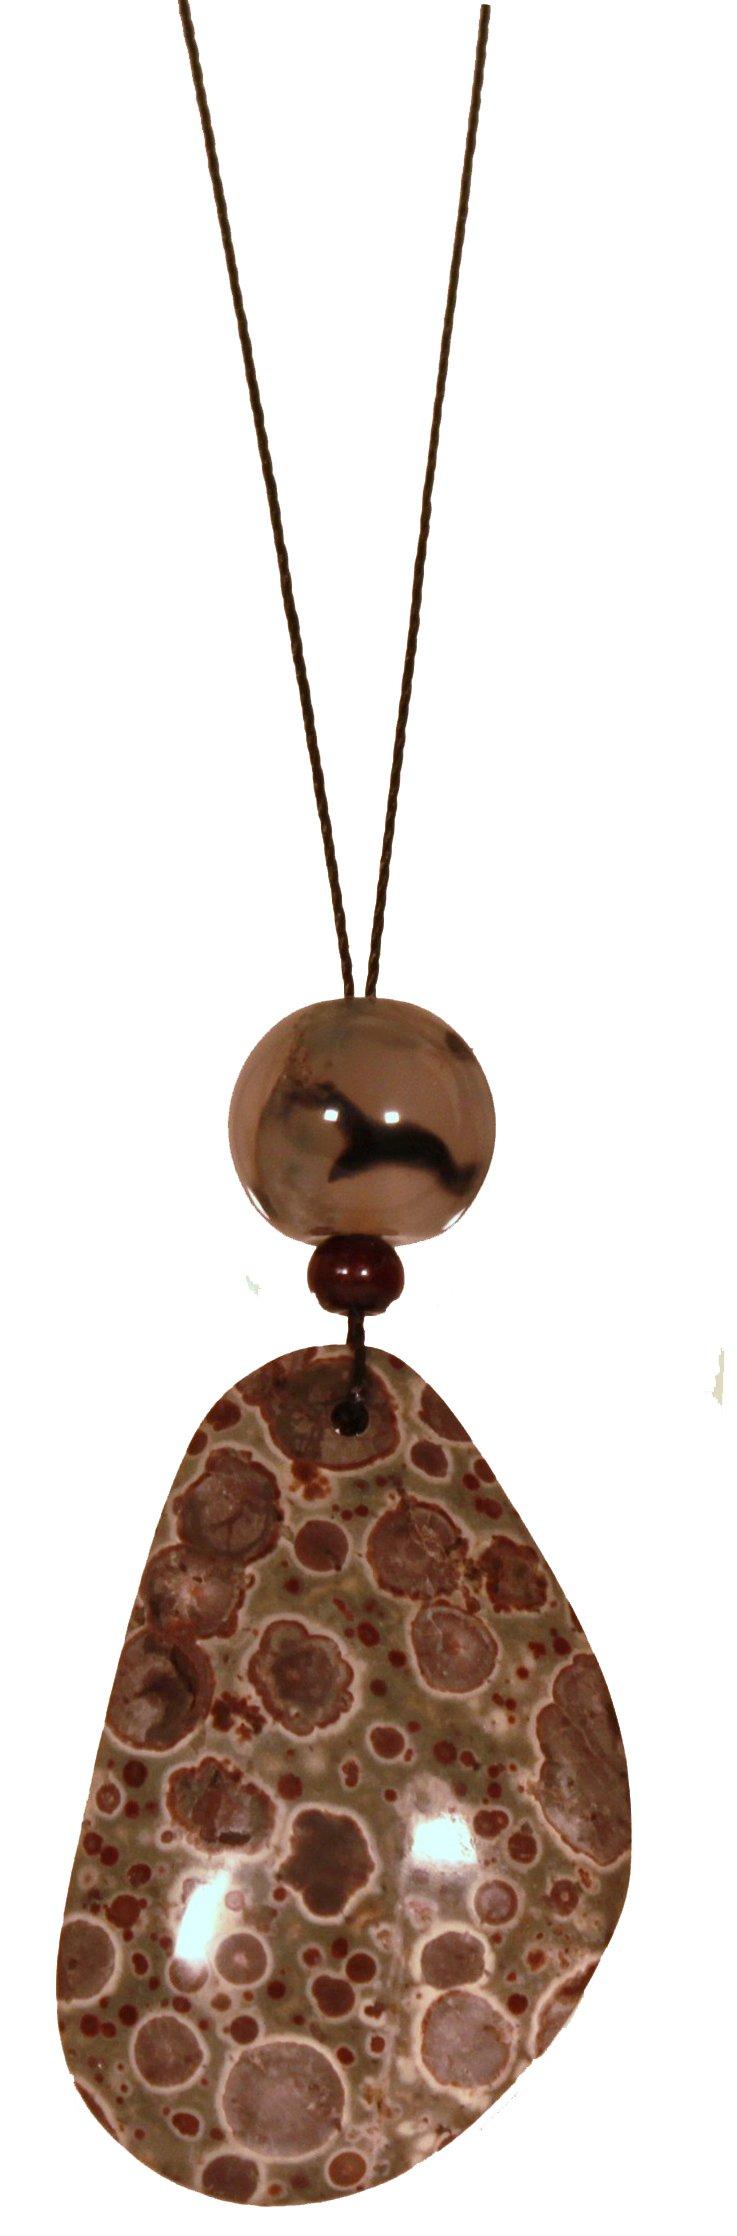 Pendulum / Spiderweb / Chakra Balancing Amulet